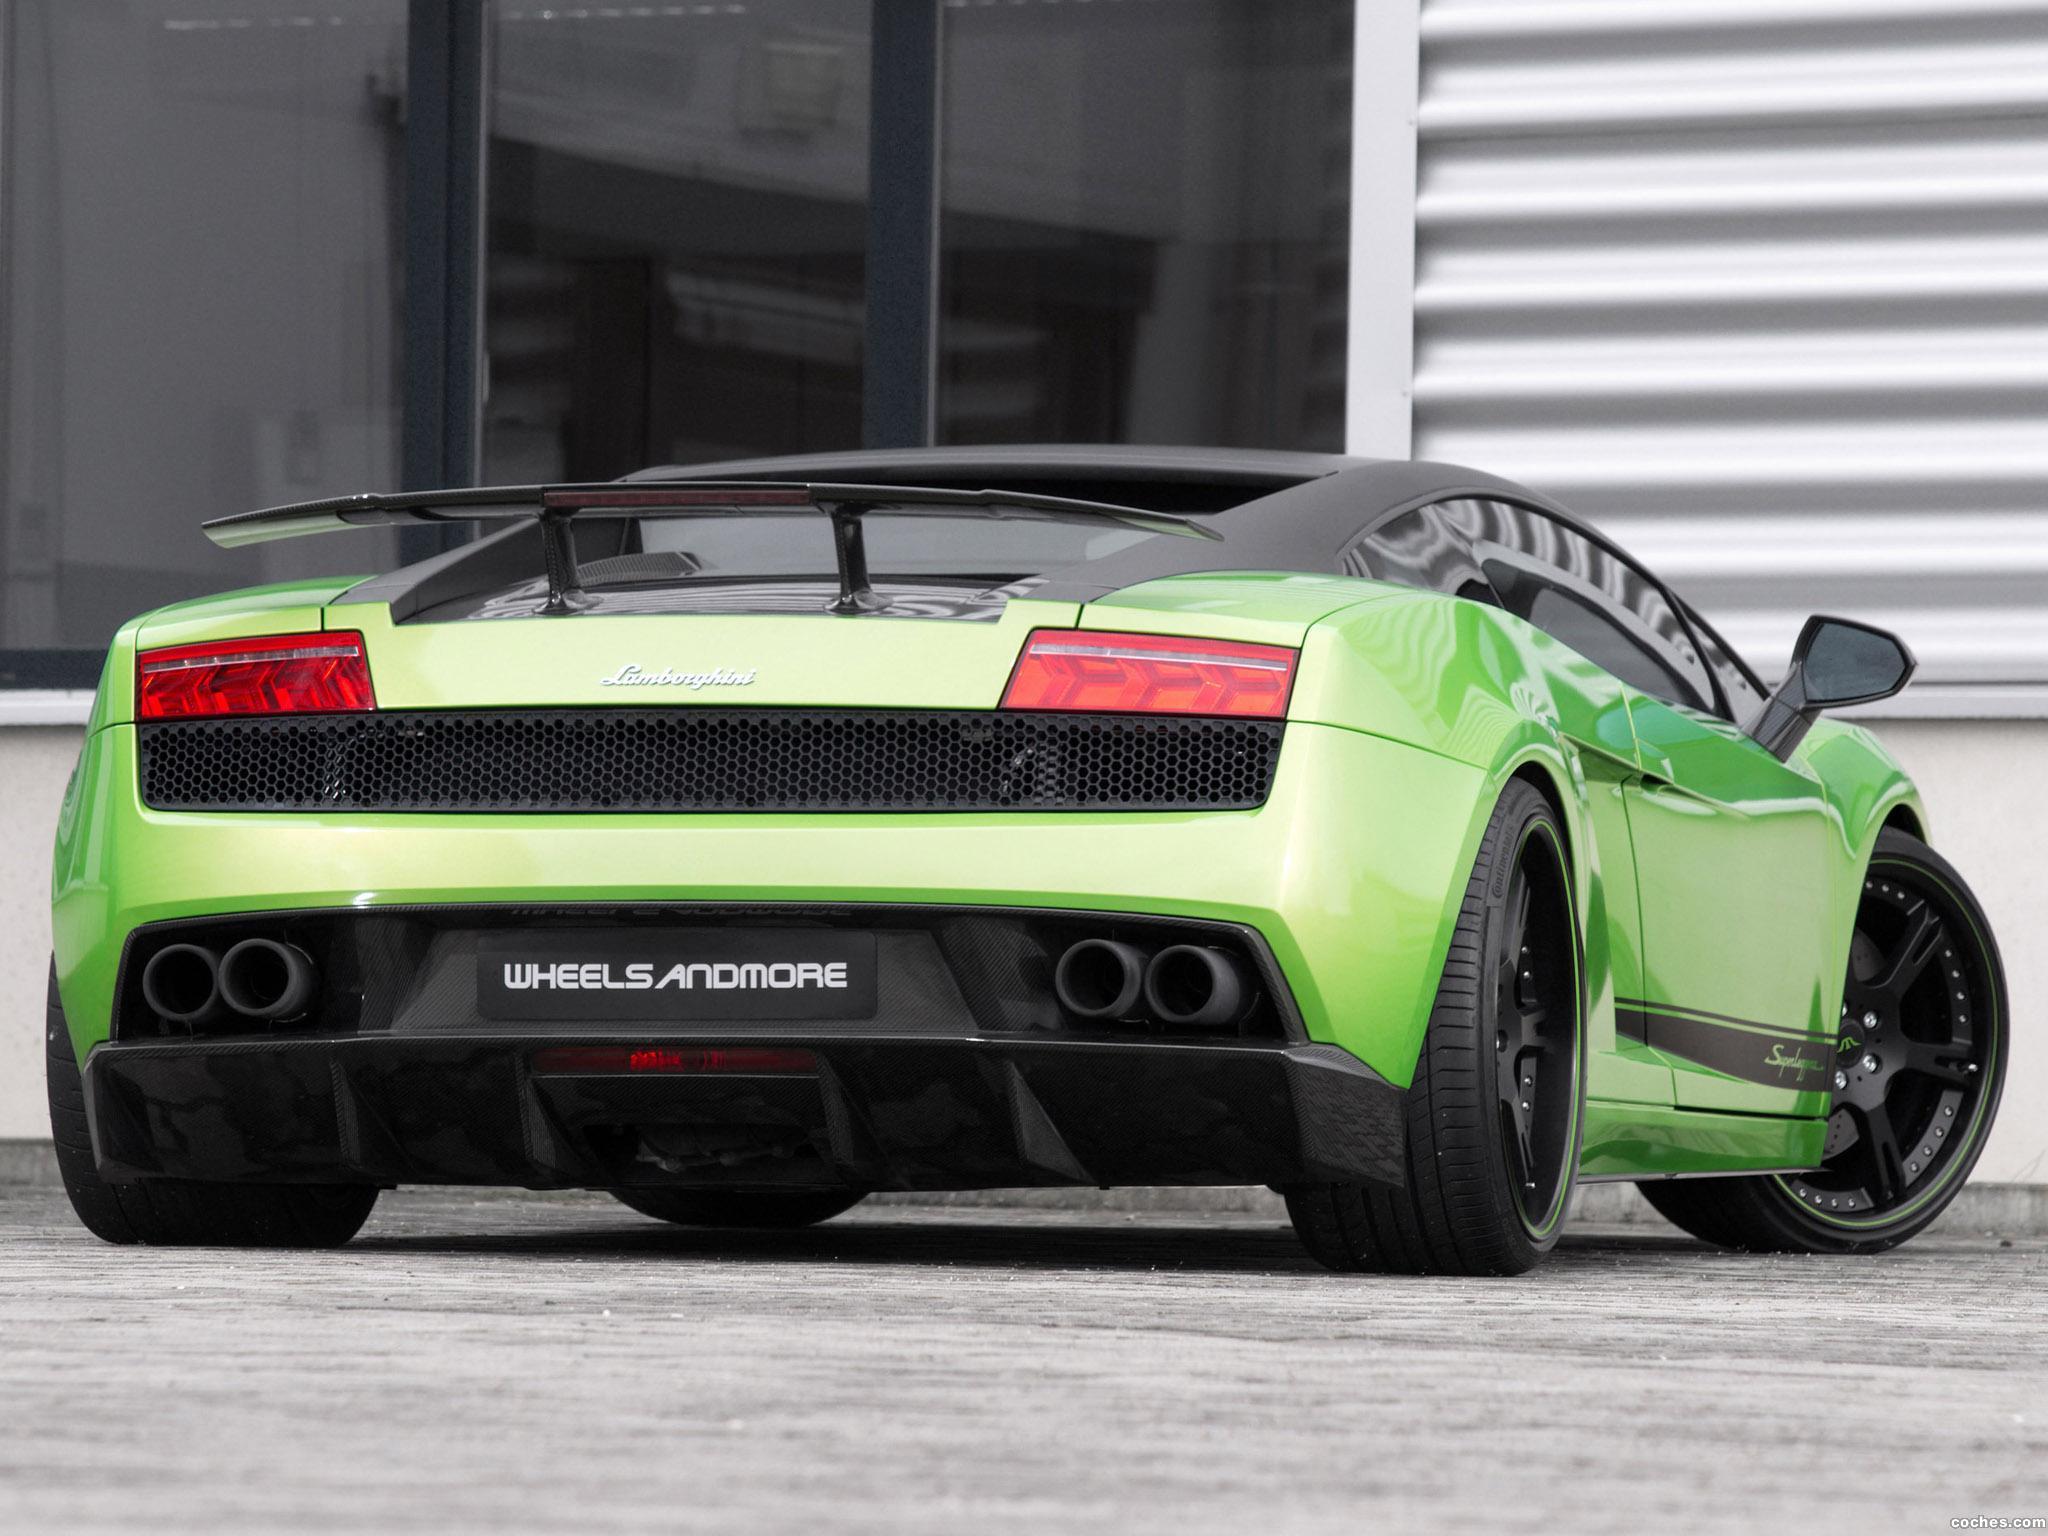 Foto 1 de Wheelsandmore Lamborghini Gallardo LP620-4 Superleggera 2012